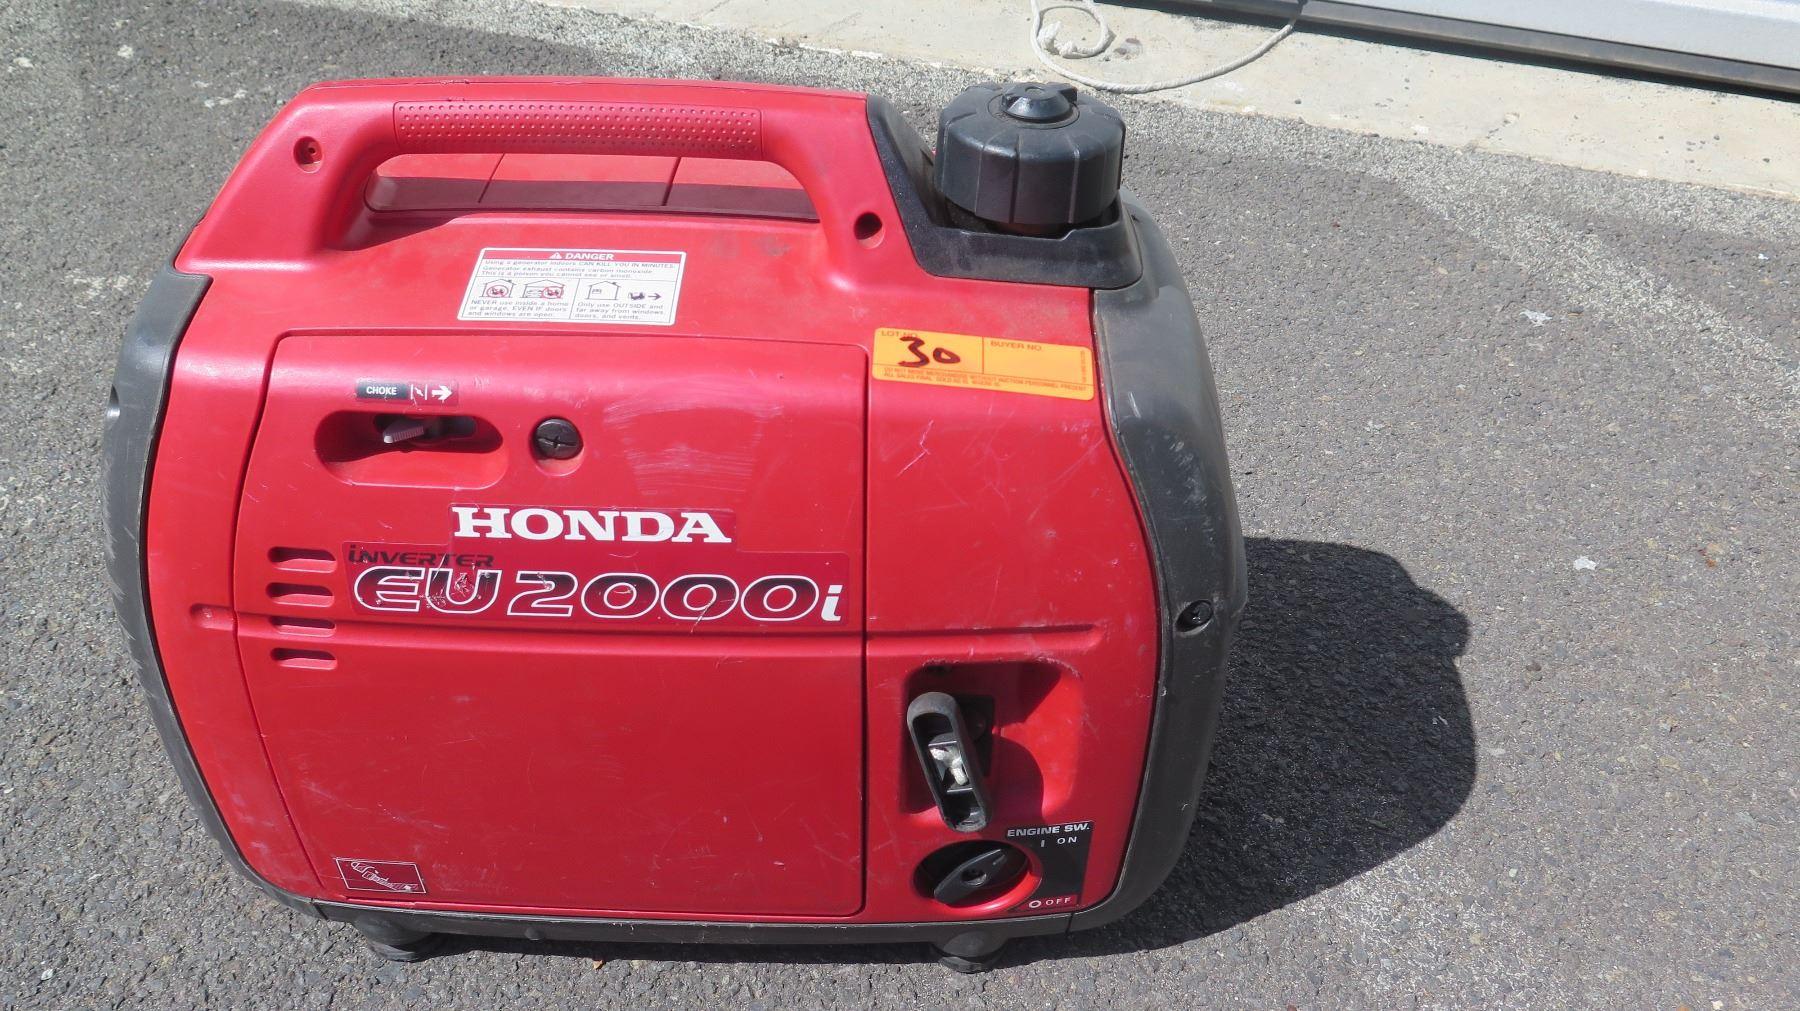 Honda EU2000I Generator - Starts and Runs, No Known Problems